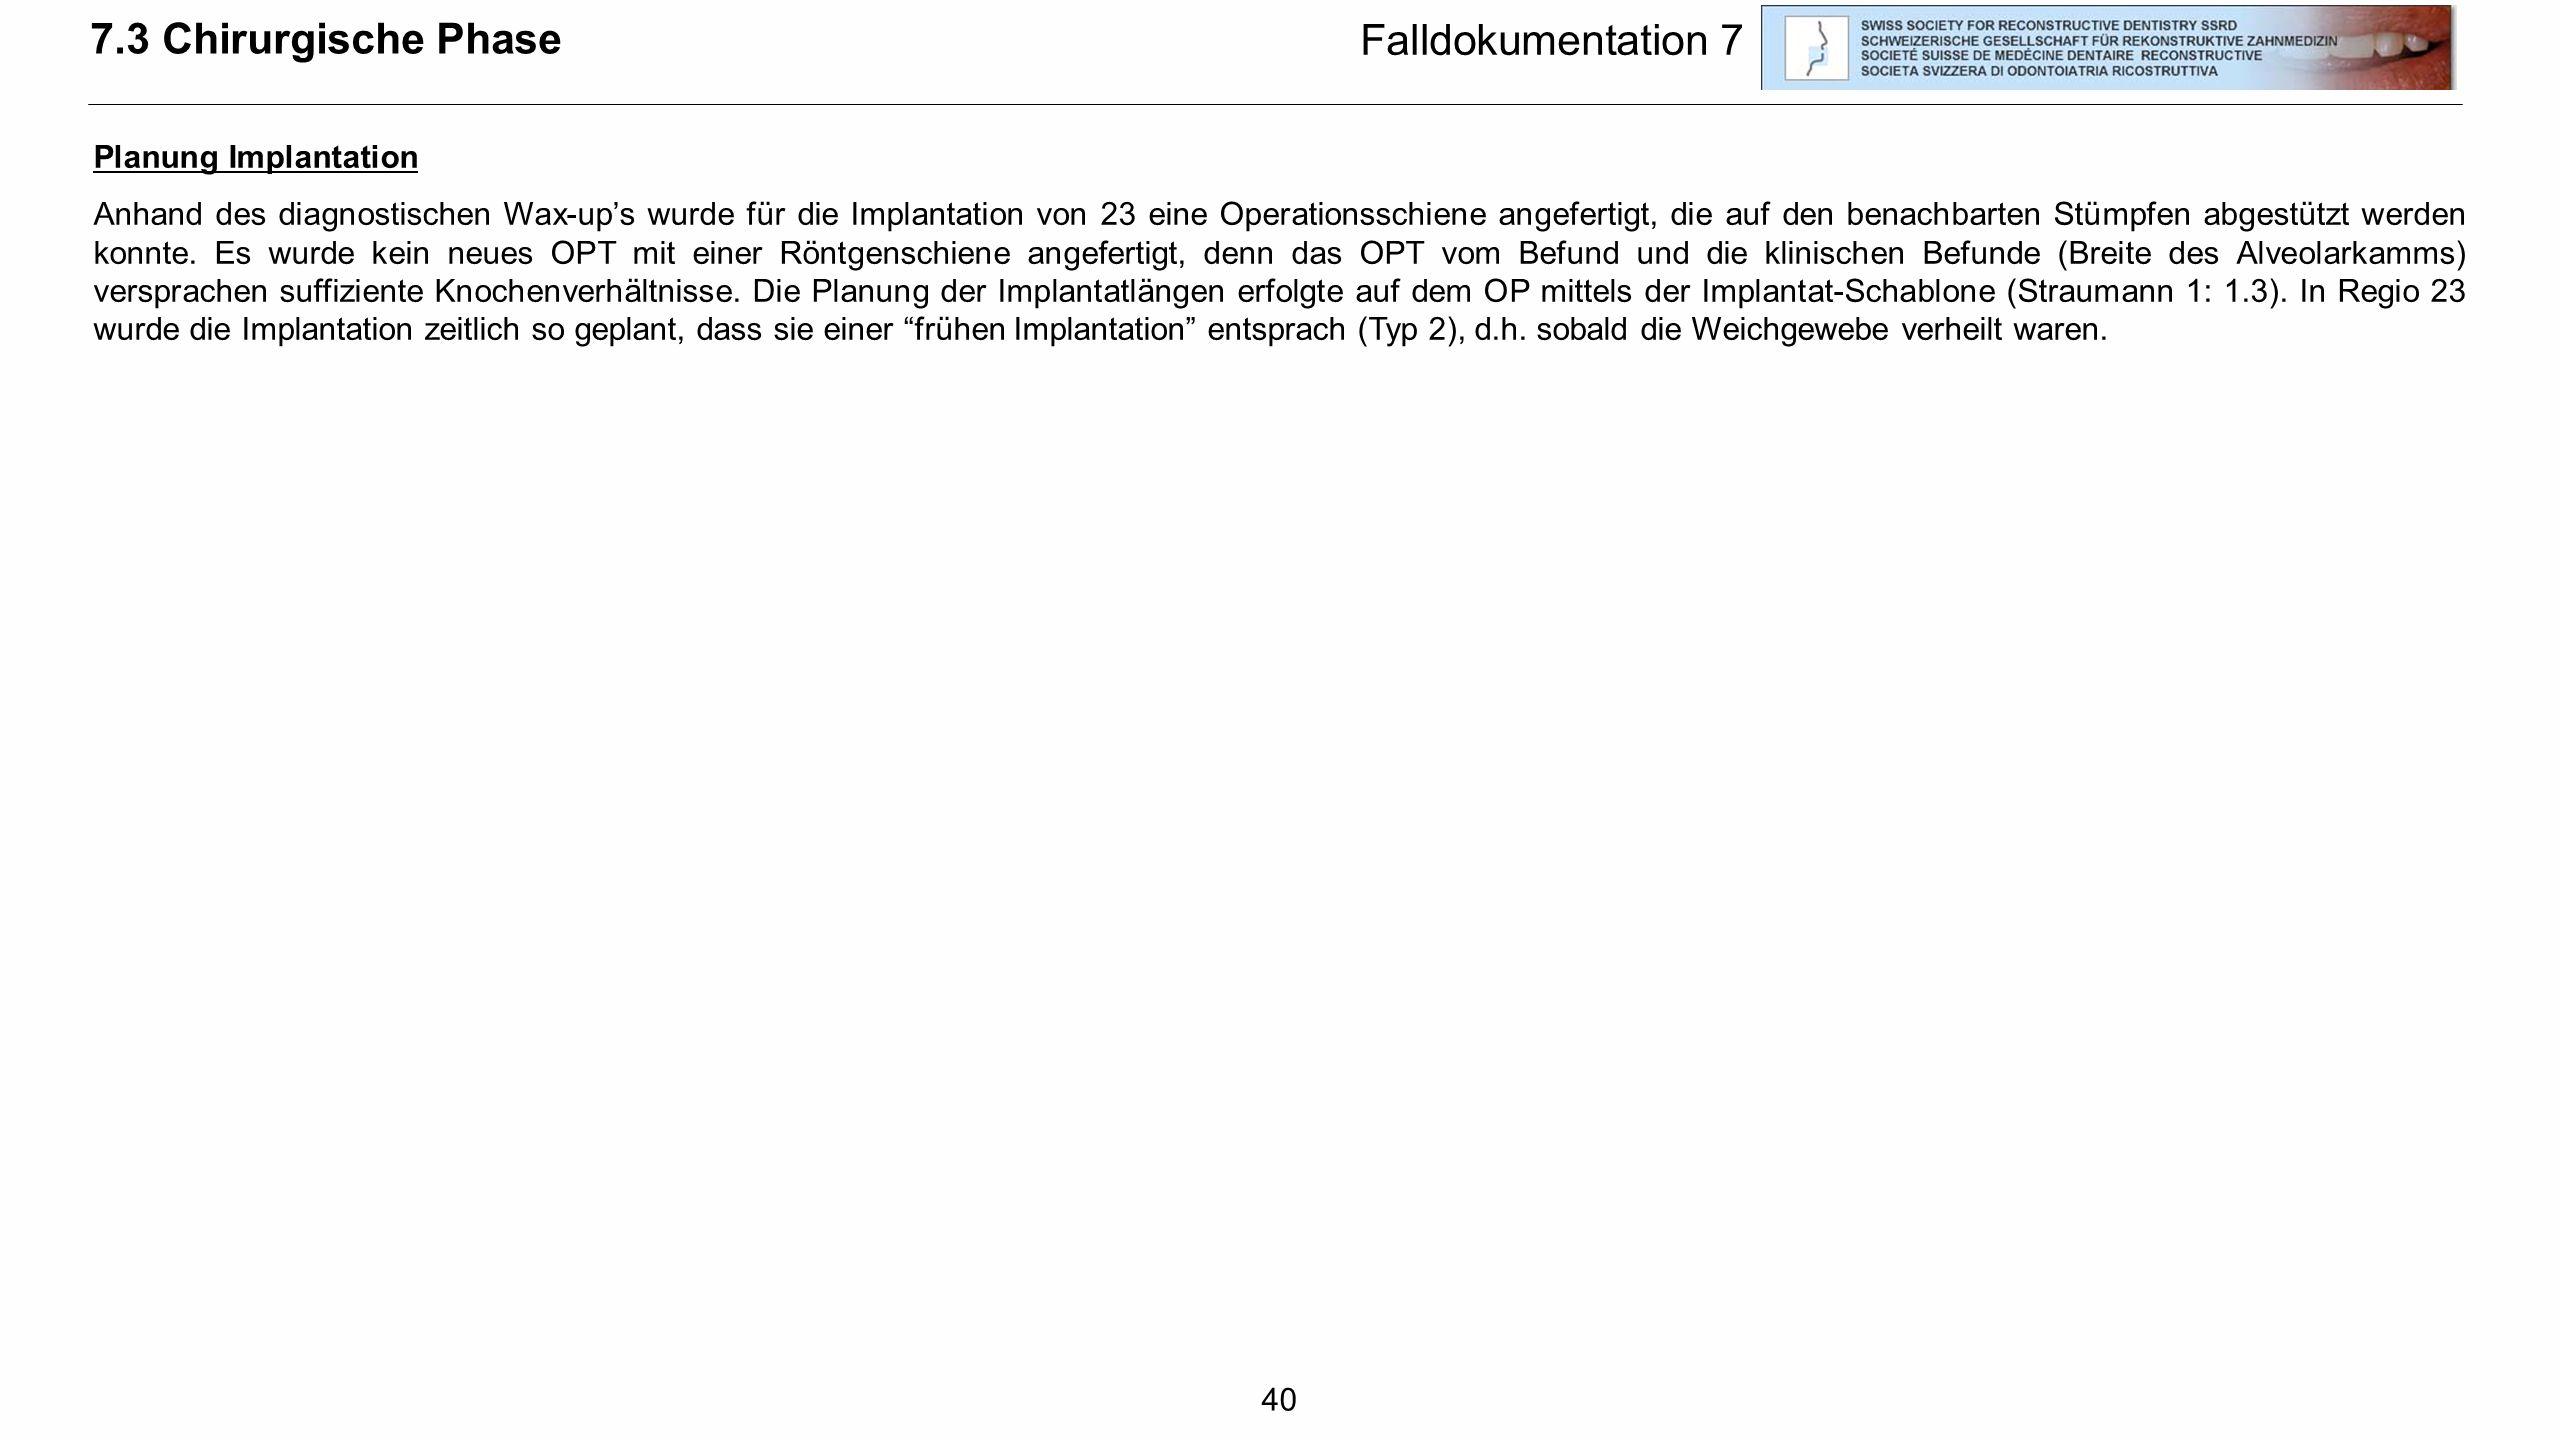 7.3 Chirurgische Phase Falldokumentation 7 Planung Implantation